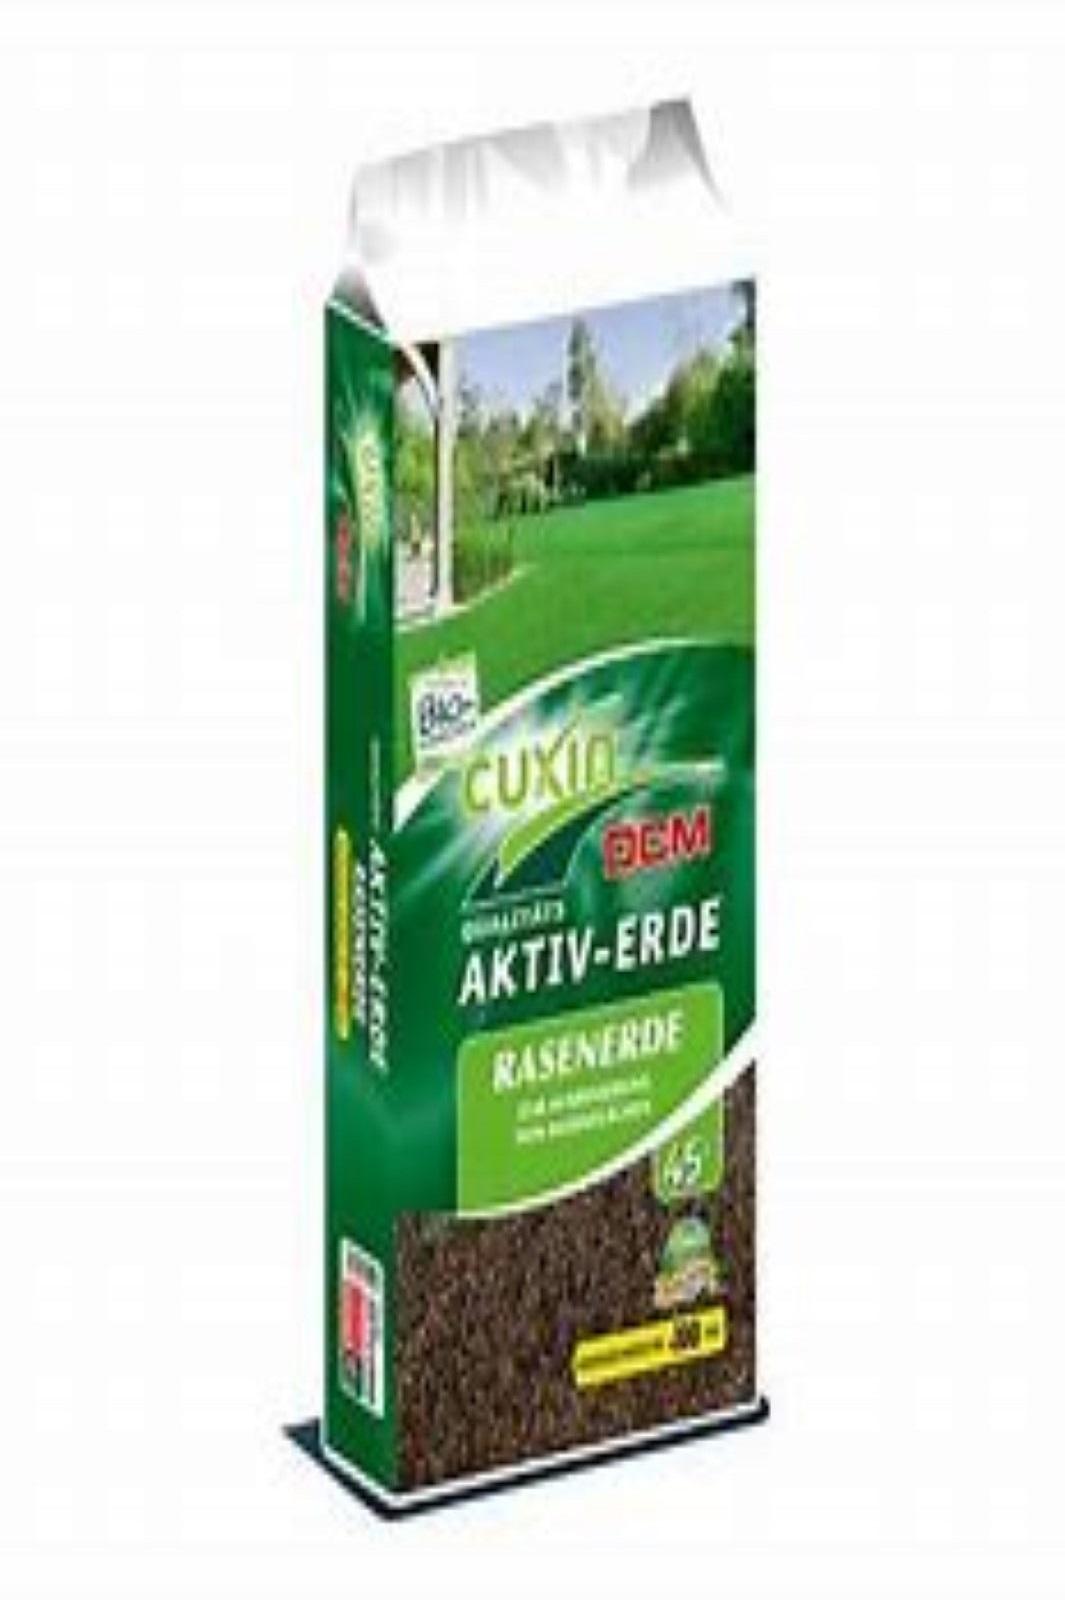 Cuxin DCM Aktiv Erde Rasenerde 45 Liter